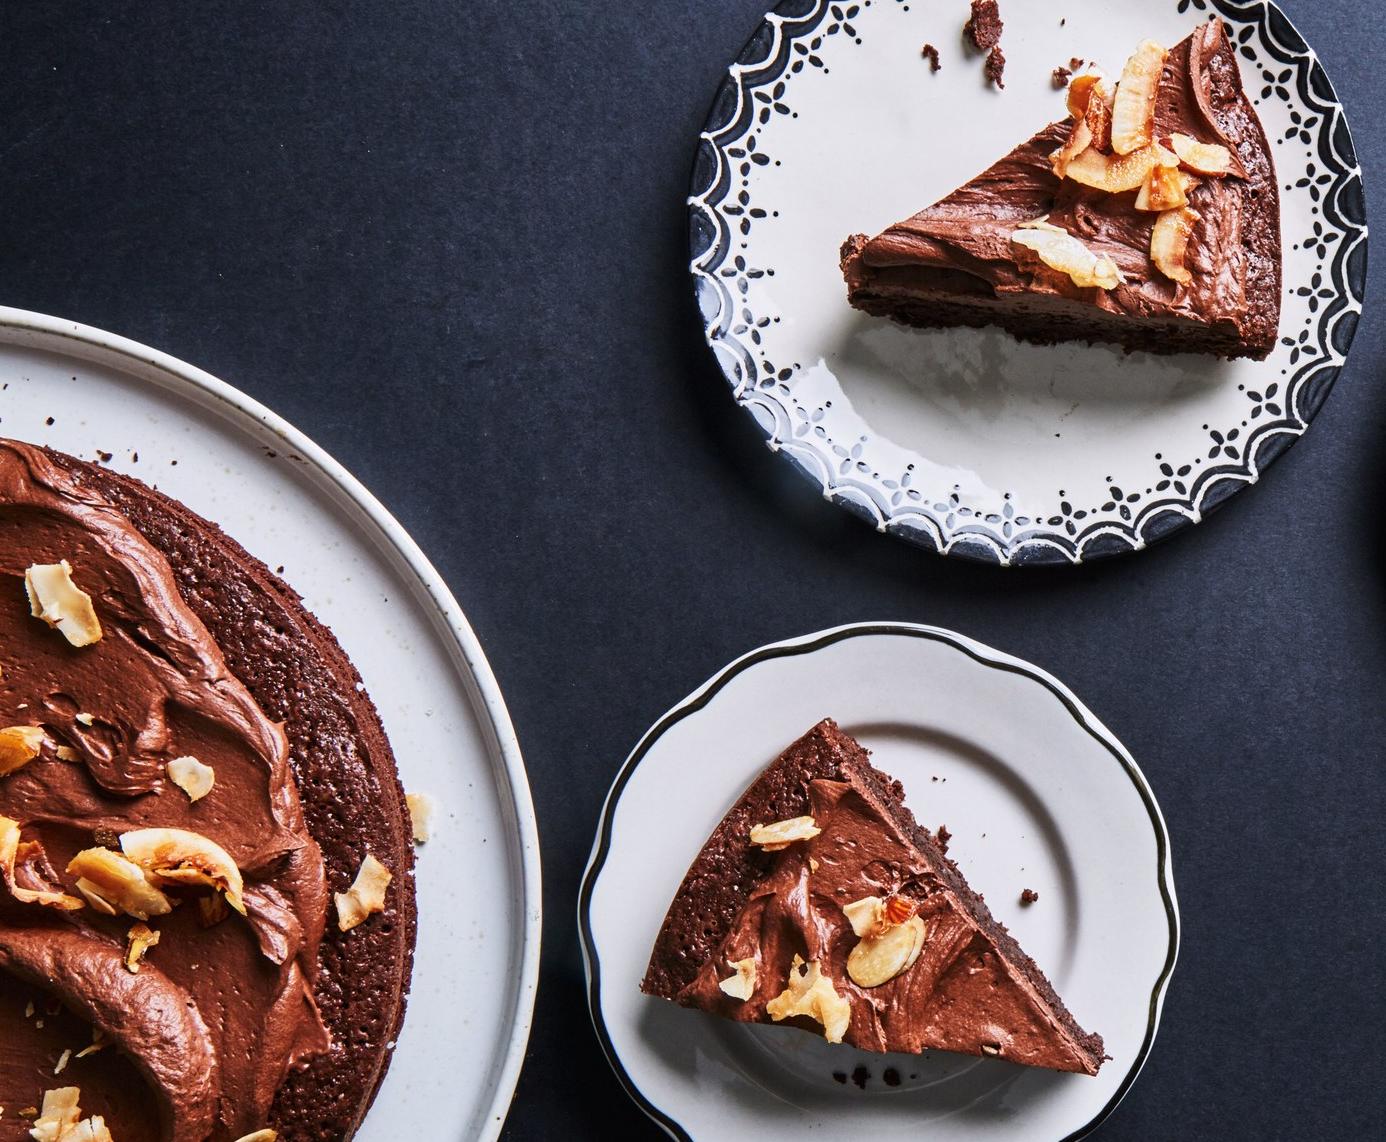 Bregman S Cake Recipe